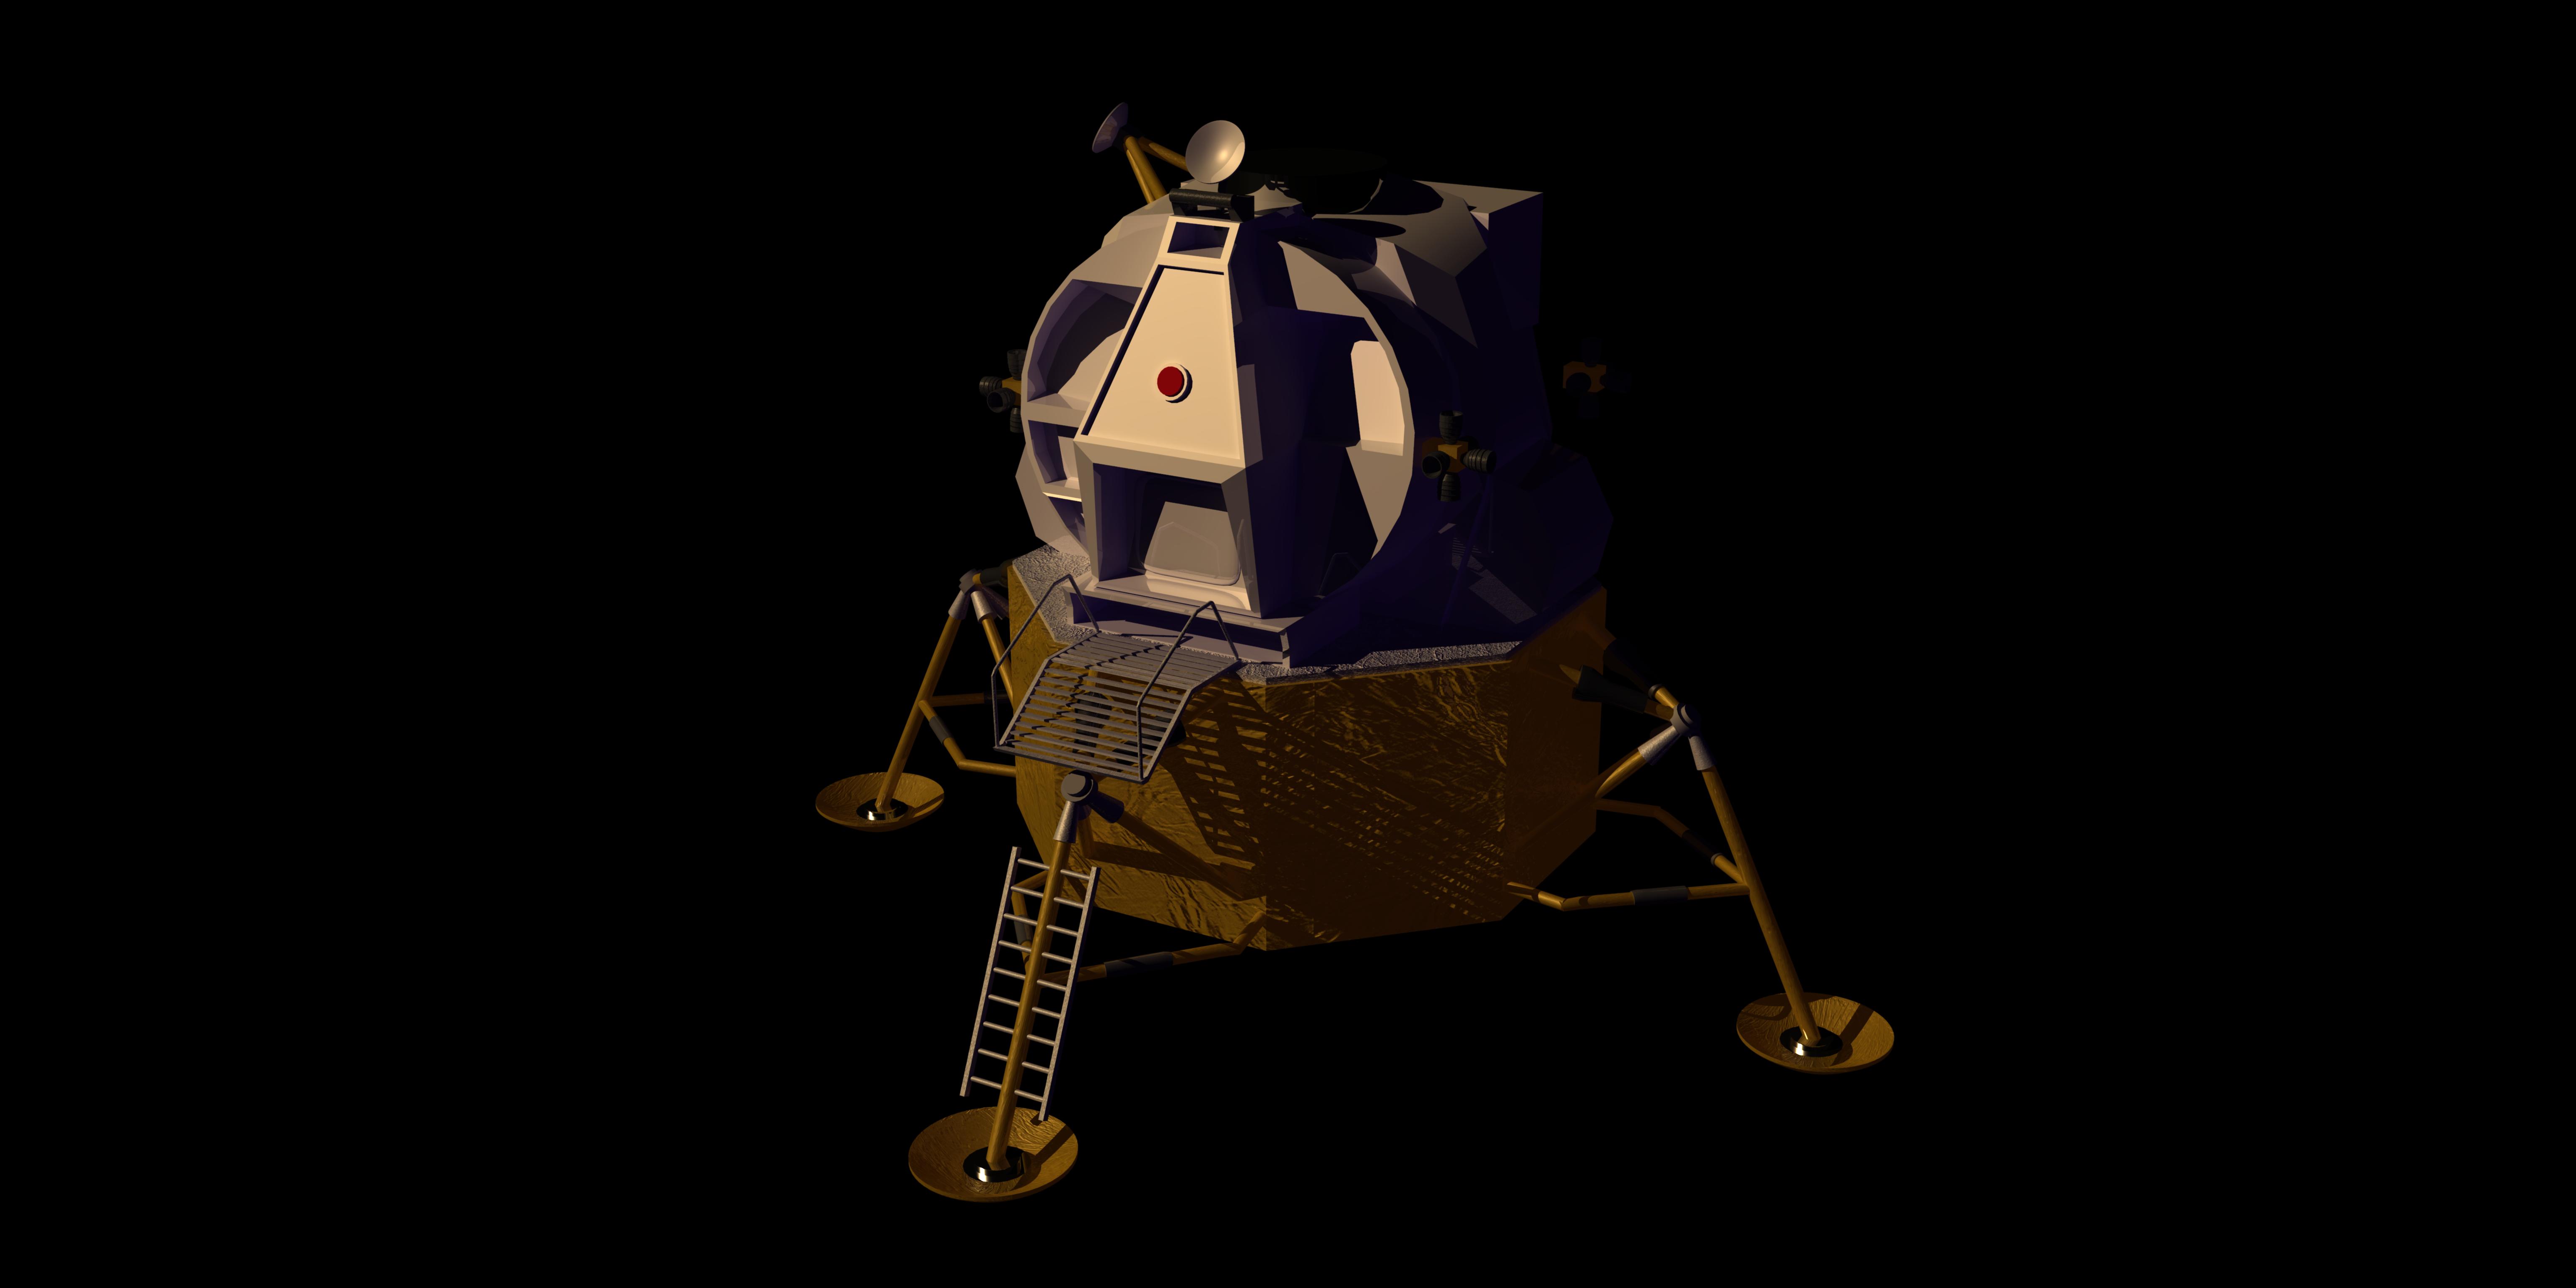 Apollo_final_6k